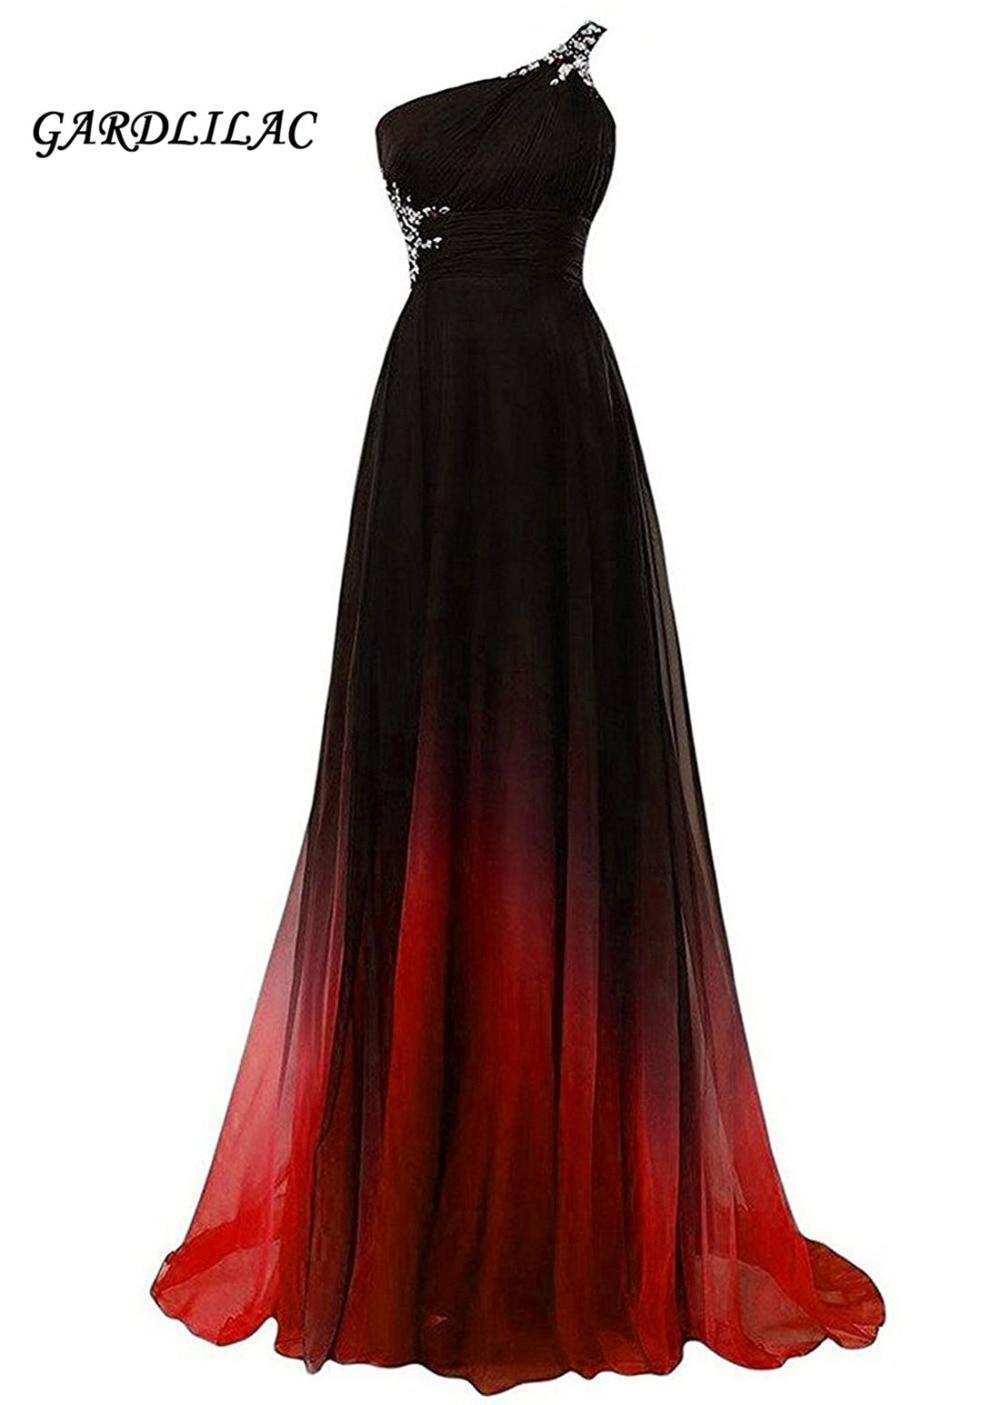 Beaded One Shoulder Gradient Chiffon Evening Dresses Vestido Longo Prom Dress 2019 Ombre Prom Long Elegant